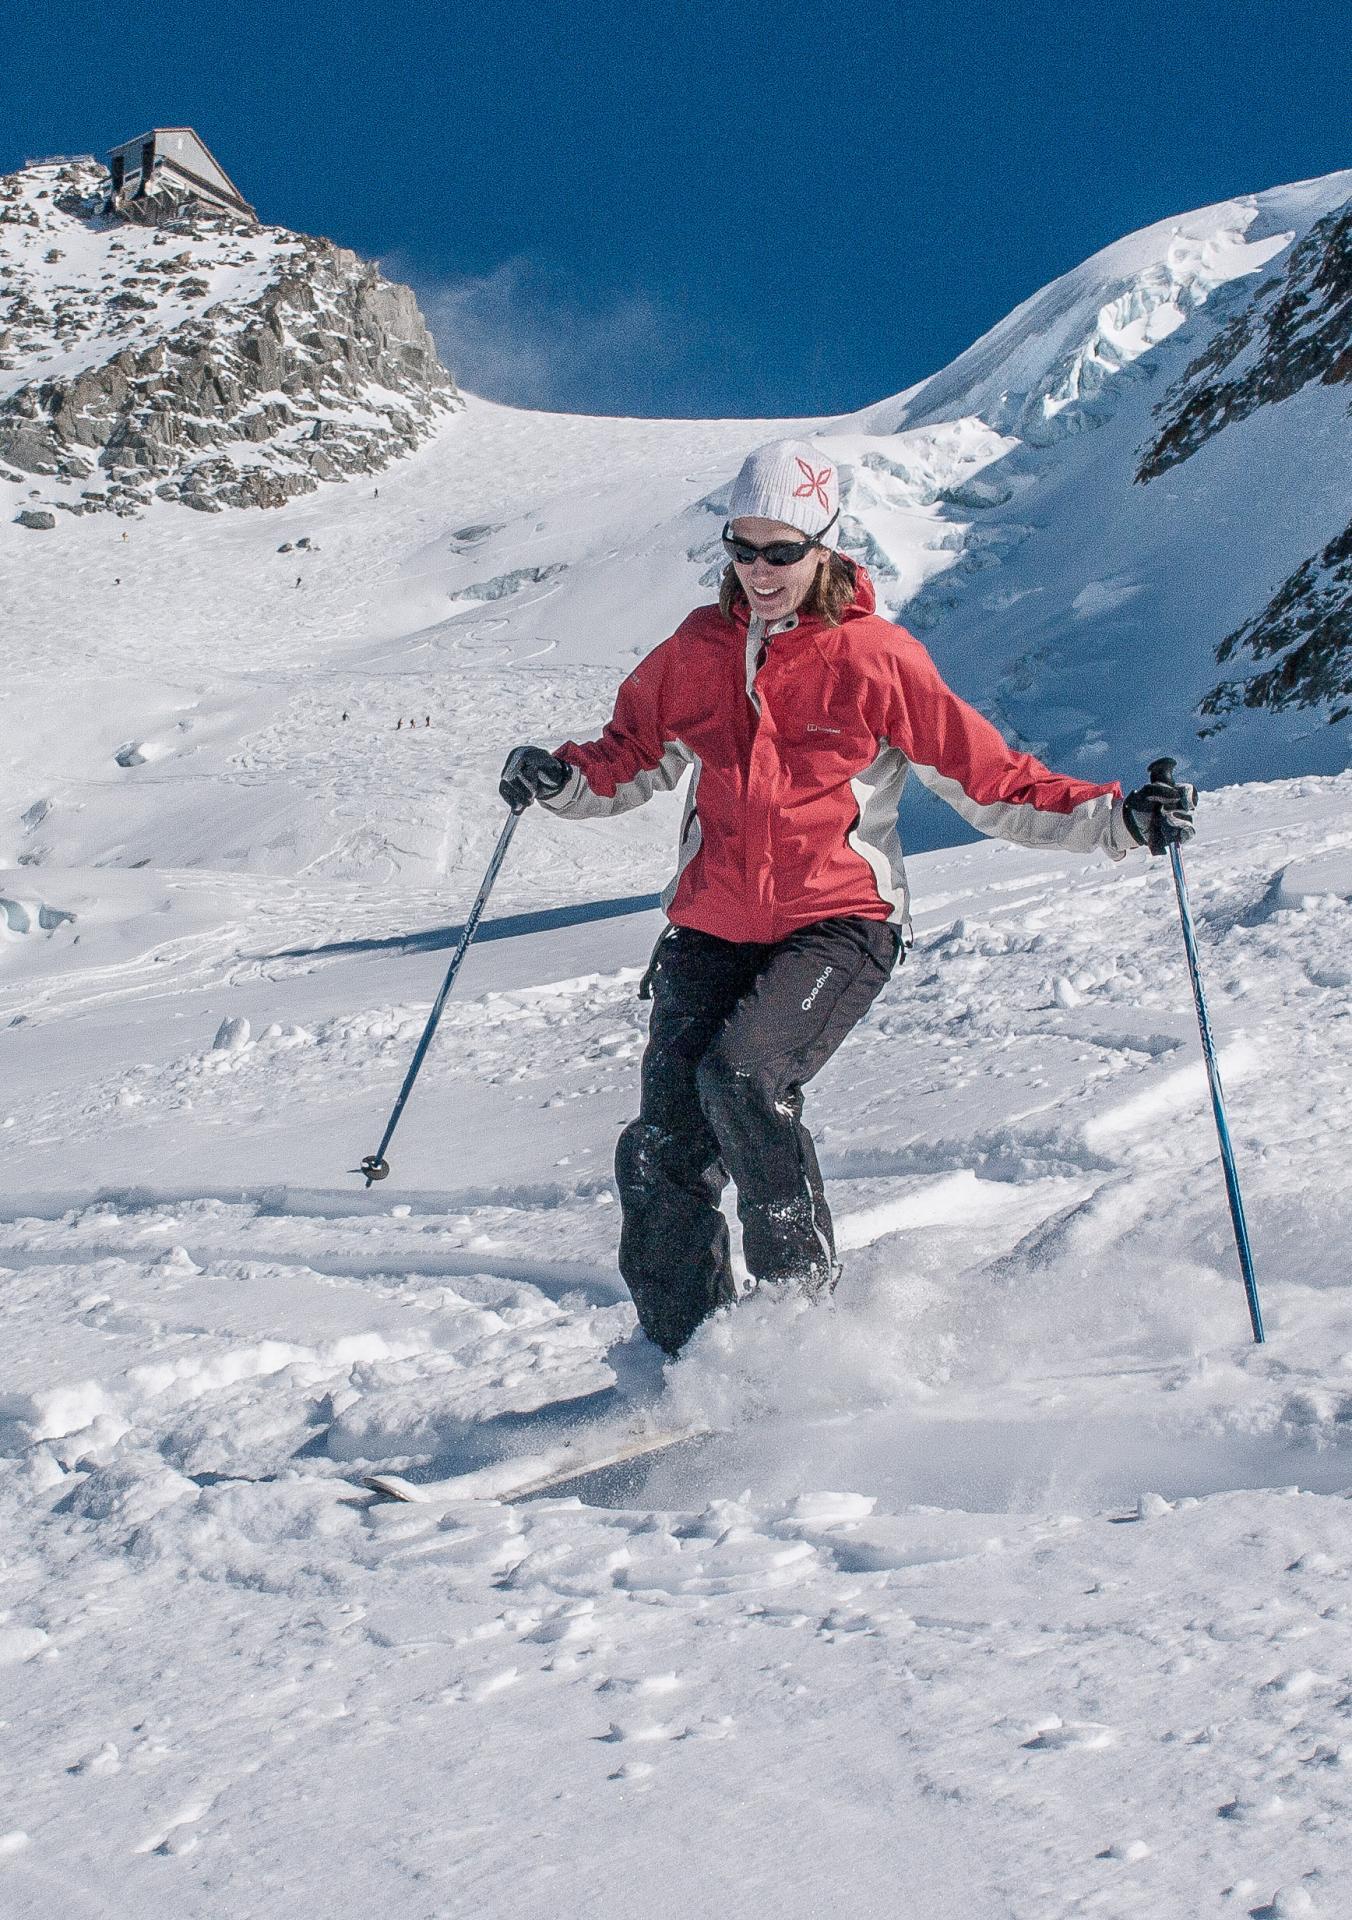 chamonix-moniteur-ski.jpg